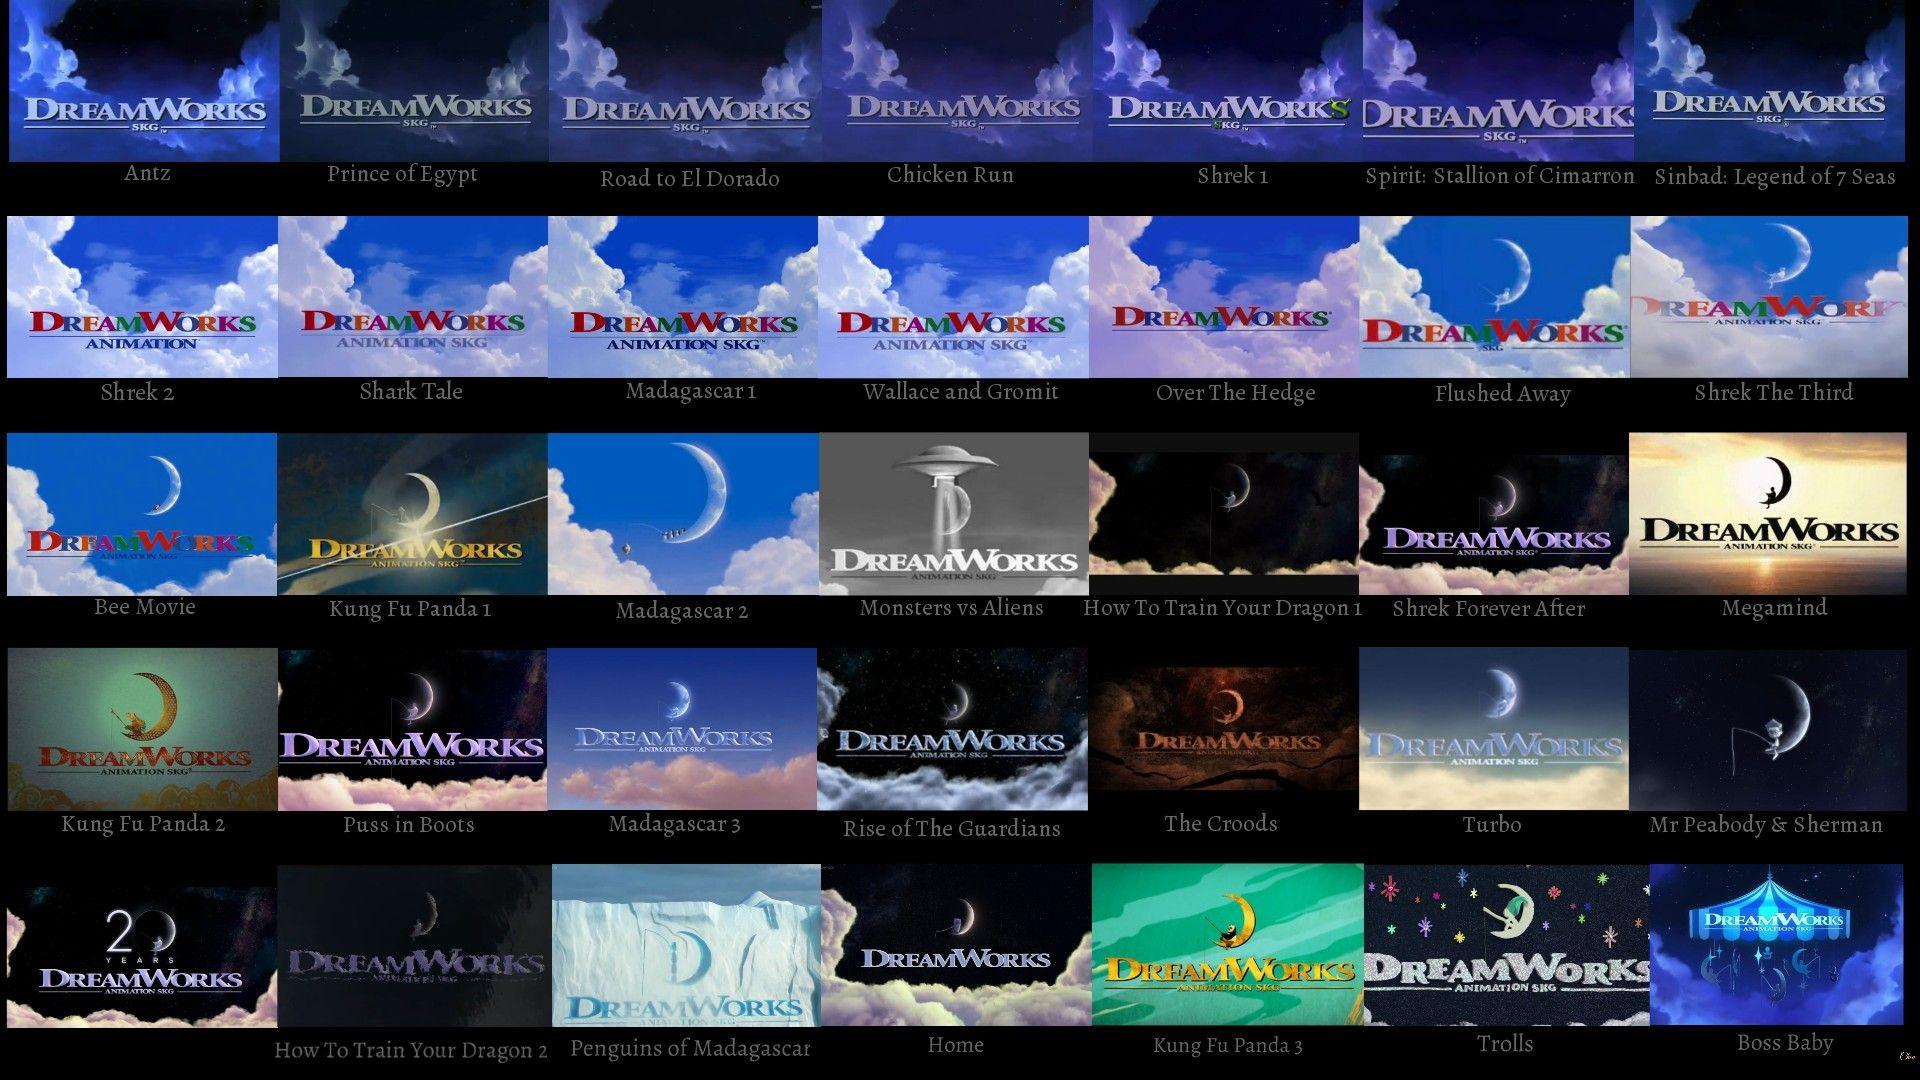 Dreamworks Animation Skg Home Entertainment |Dreamworks Animation Skg Studios